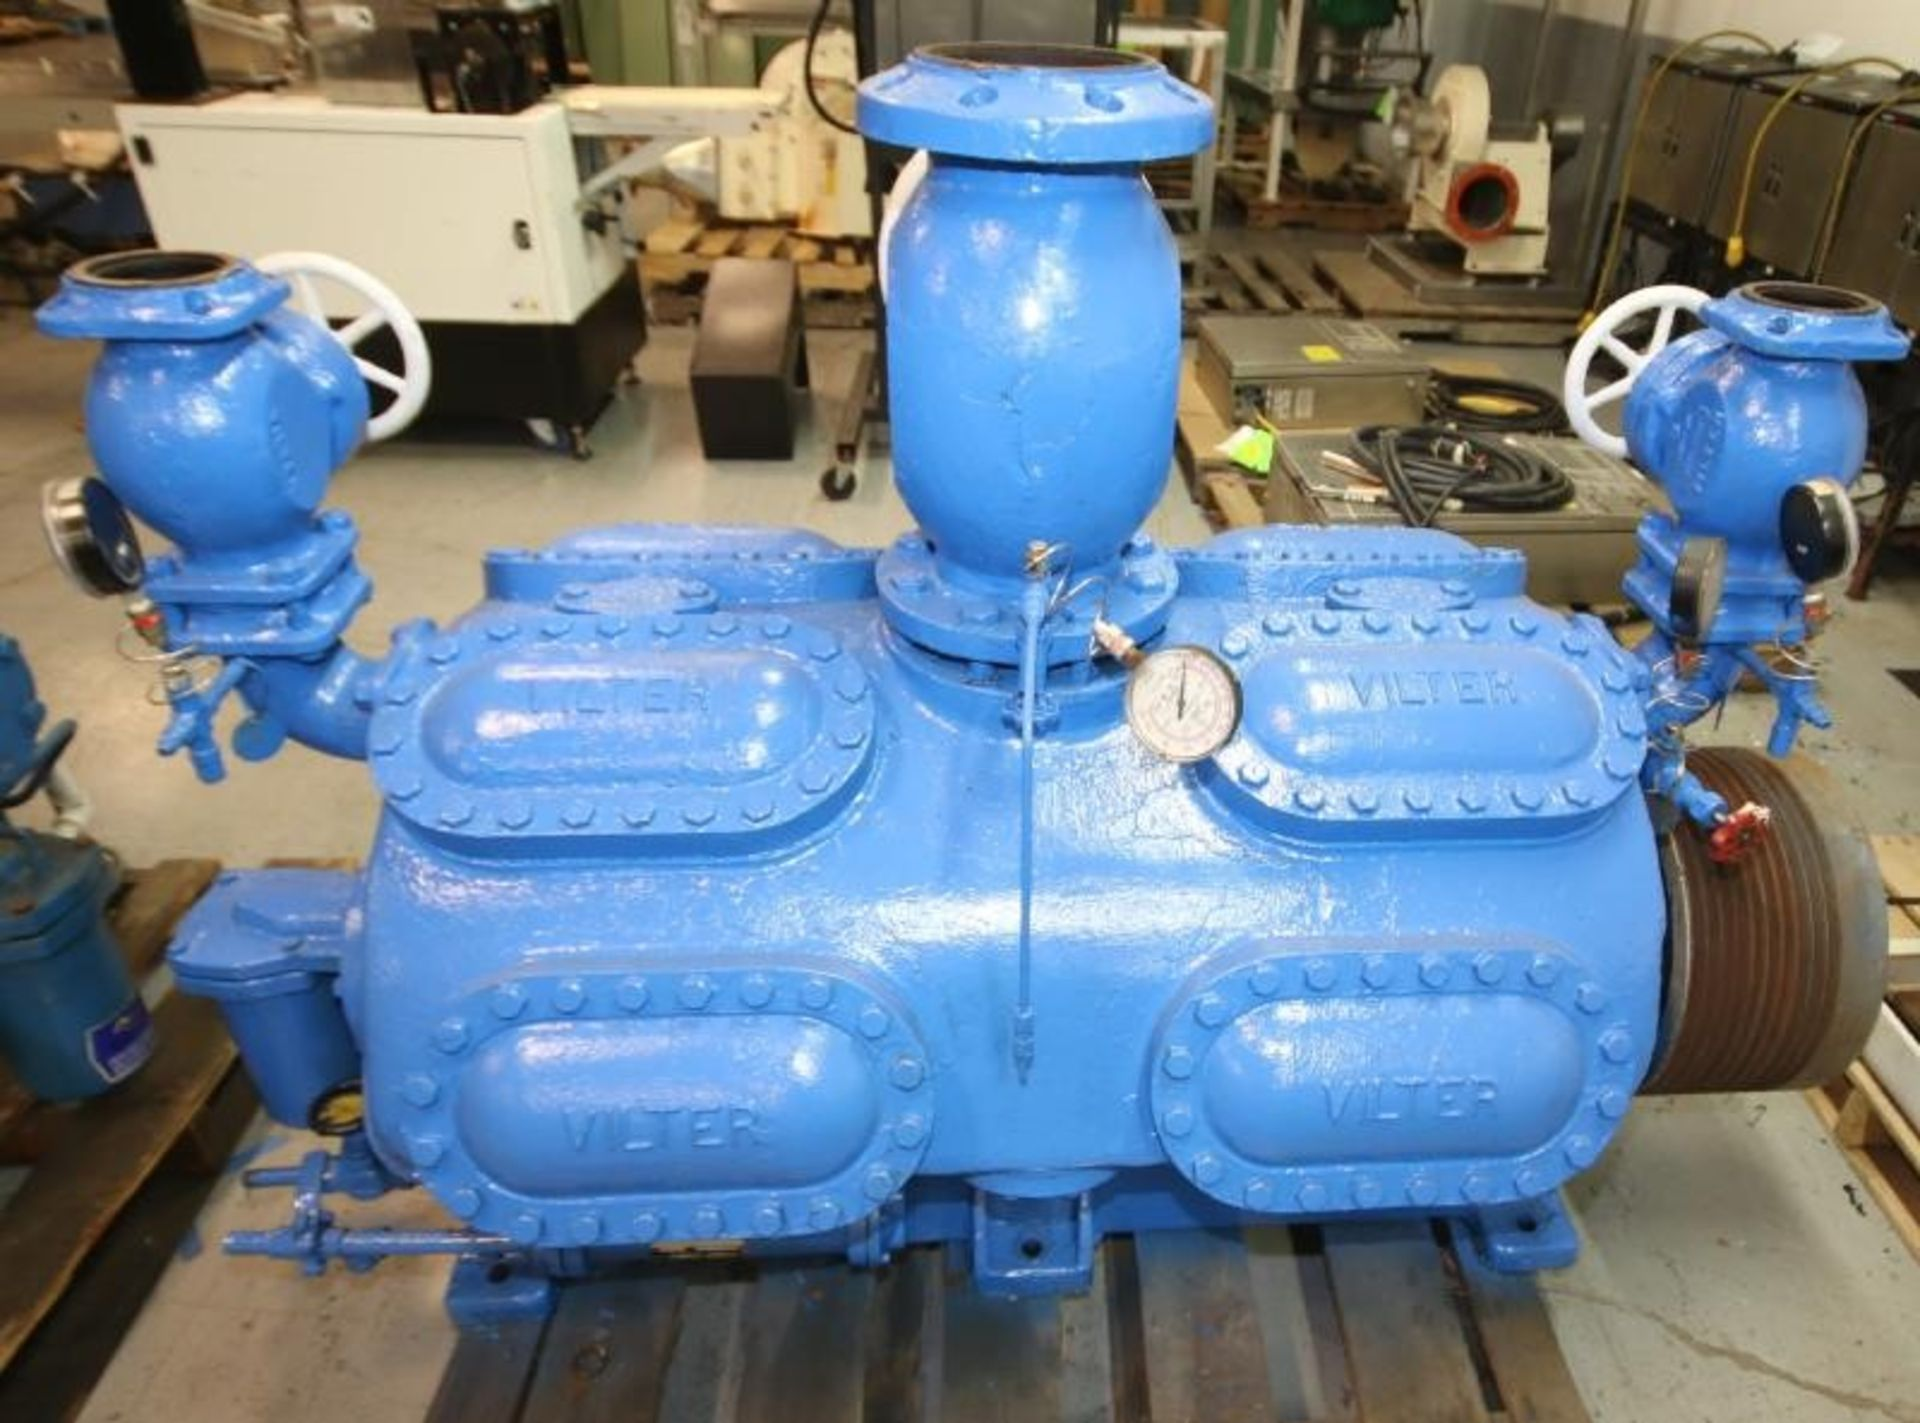 Lot 23 - Vilter 16 - Cylinder Reciprocating Ammonia Compressor Head, Size A11B4416B, SN 21056, Order No. D-